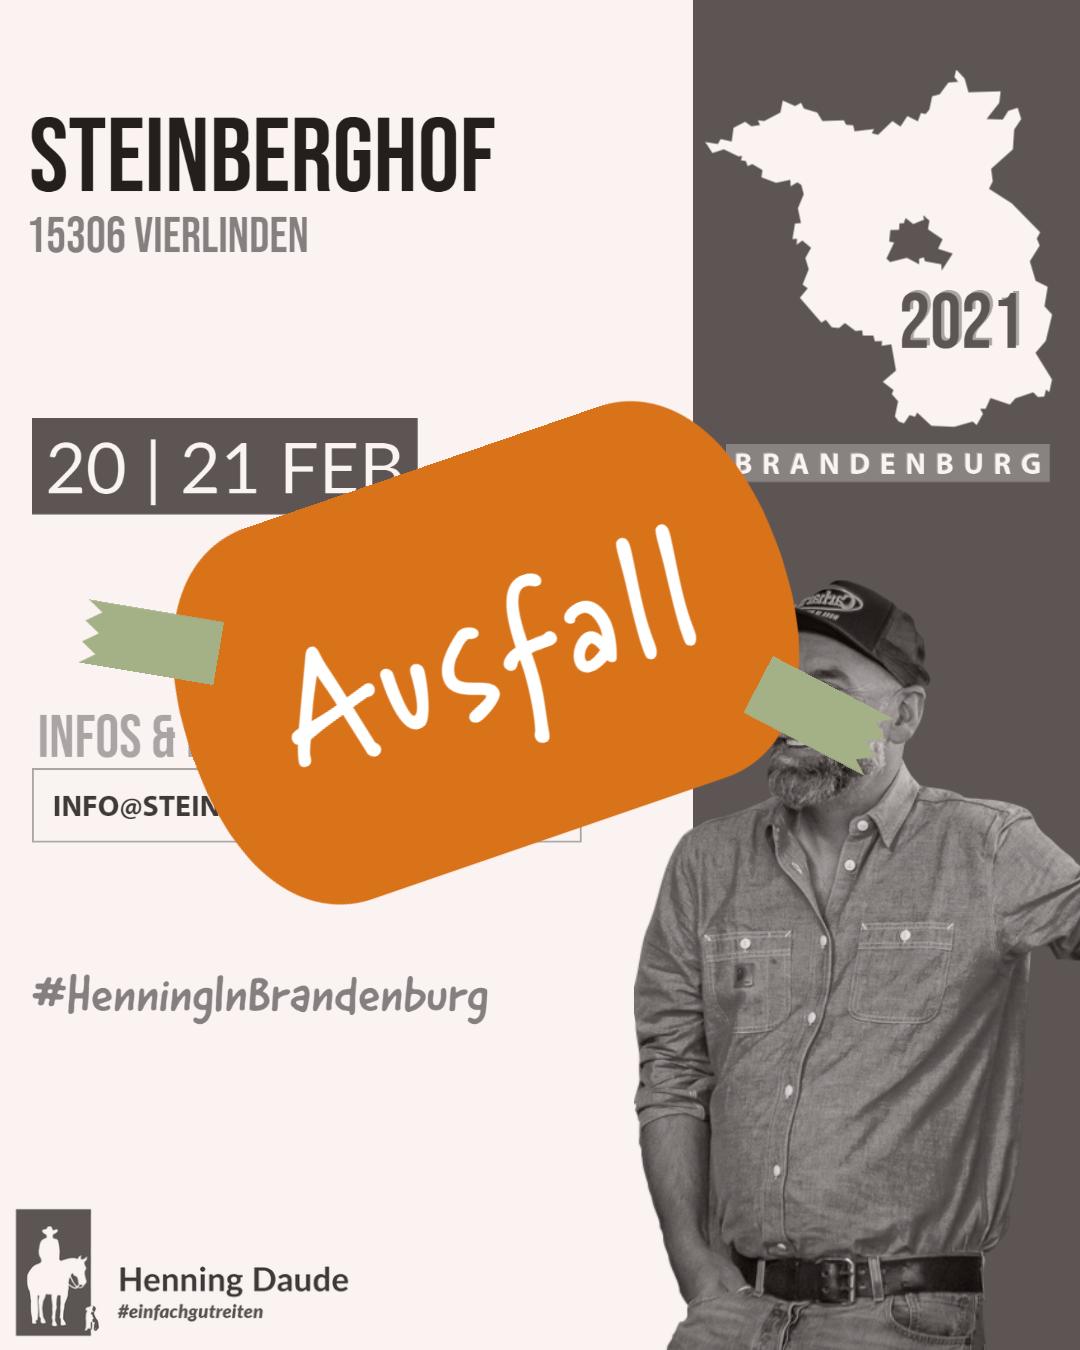 steinberghof